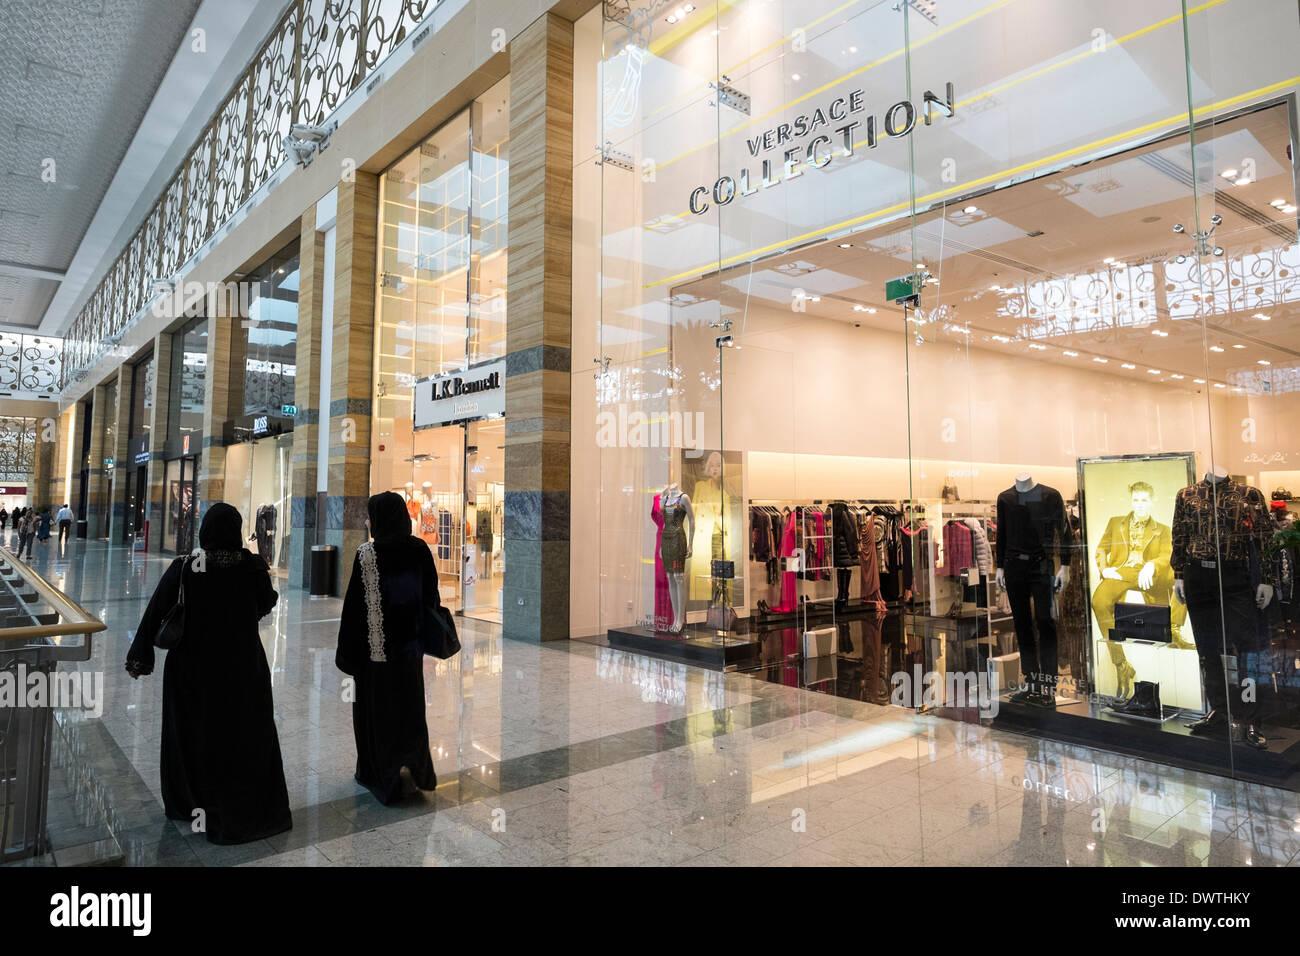 Mirdif City Centre shopping mall in Dubai United Arab Emirates - Stock Image